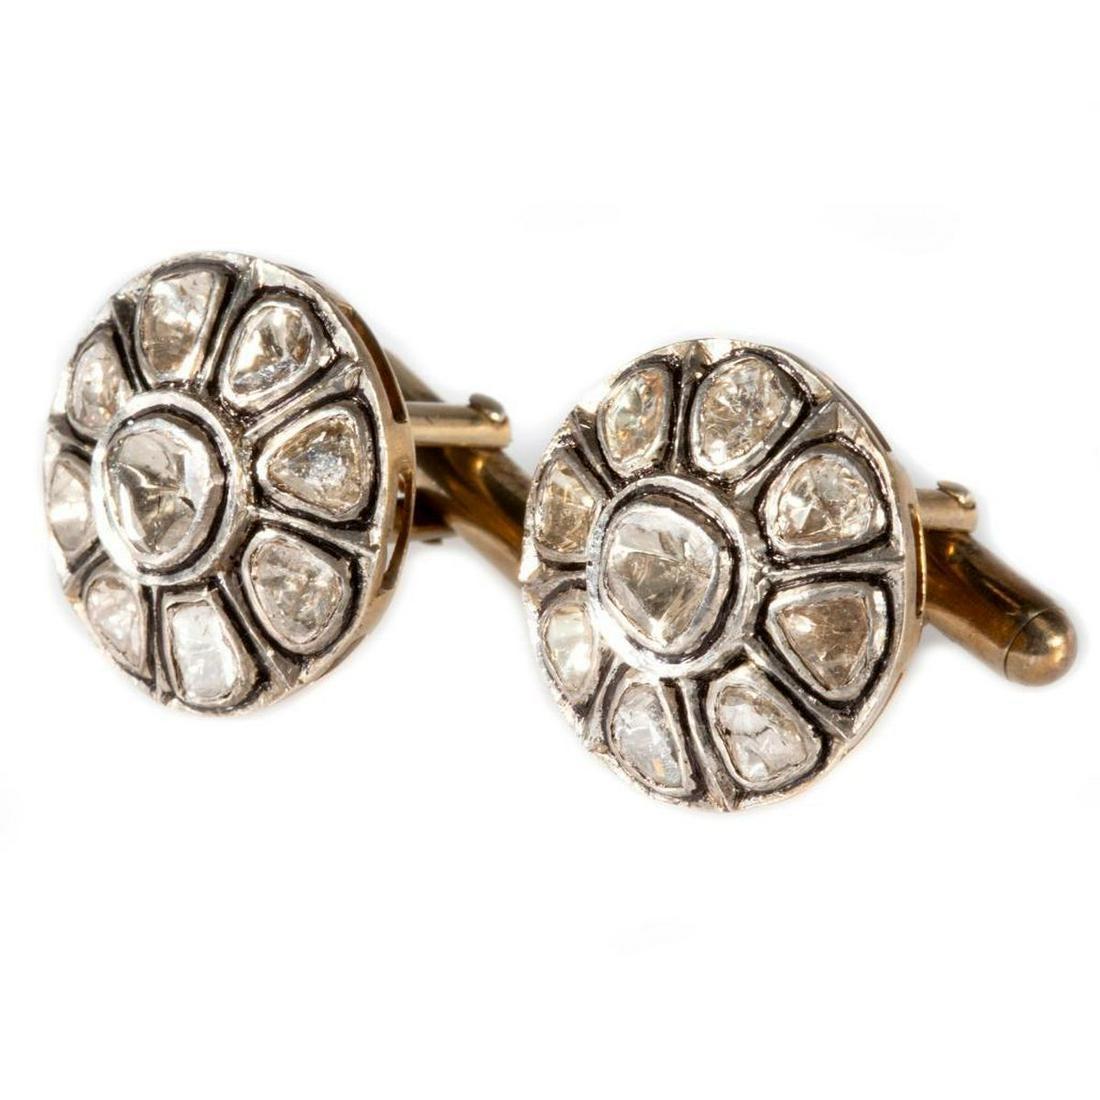 Diamond and vermeil silver cufflinks